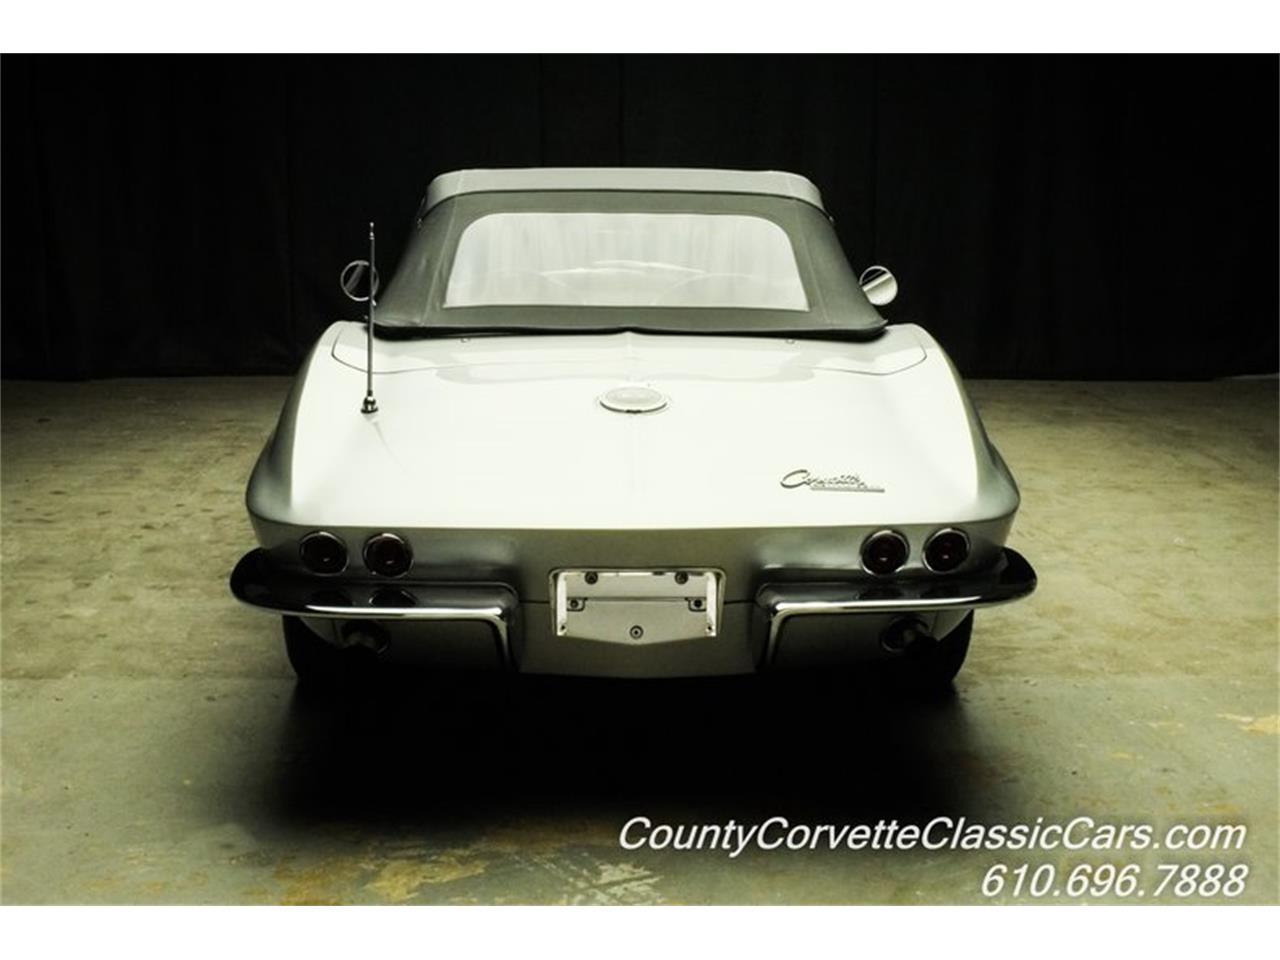 1964 Chevrolet Corvette (CC-1226888) for sale in West Chester, Pennsylvania